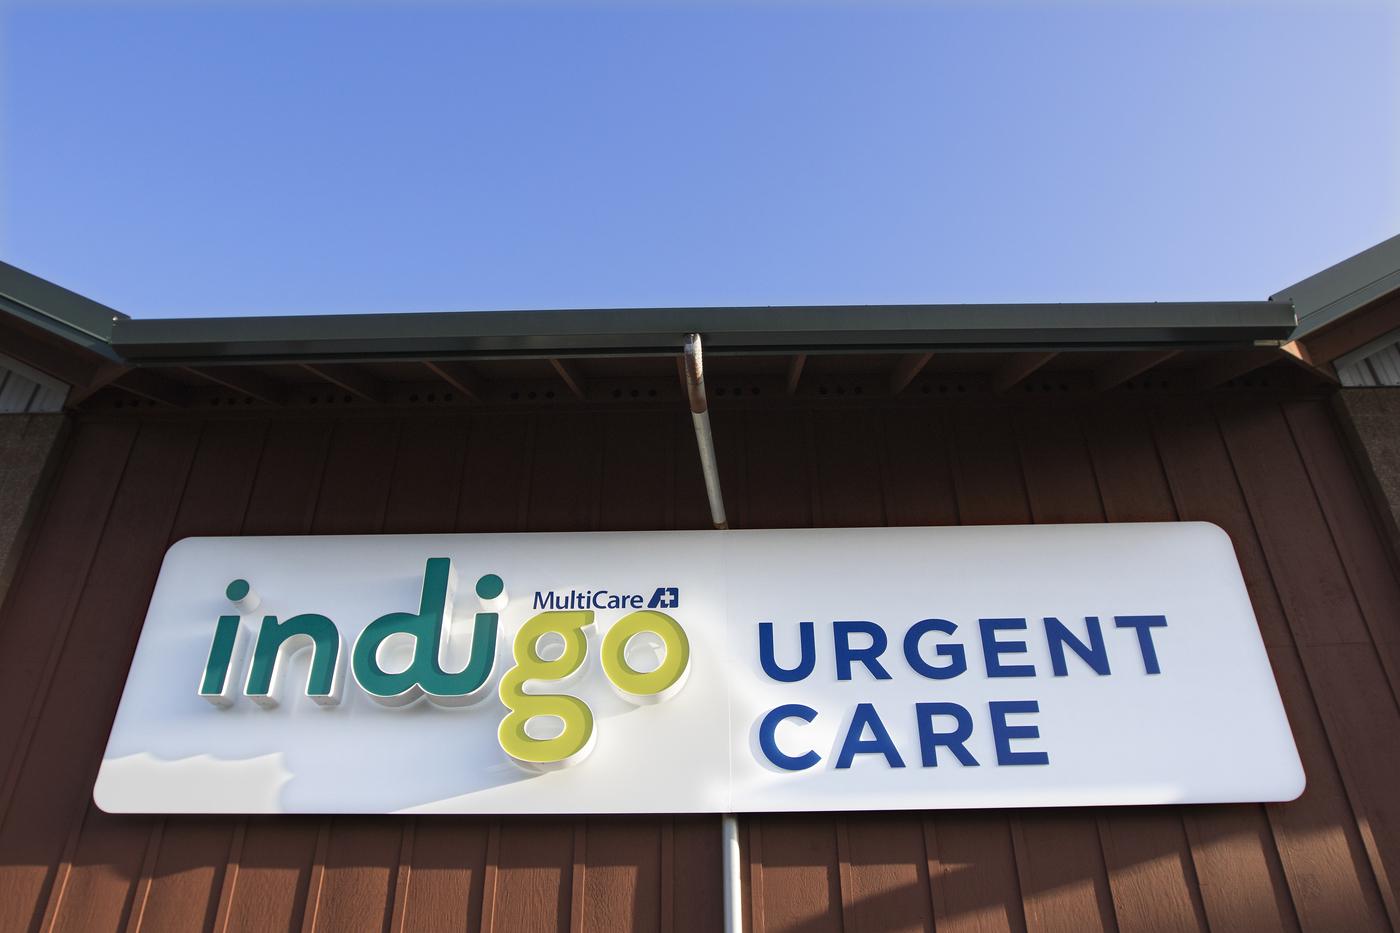 Washington's Top Rated Local® Urgent Care Center Award Winner: MultiCare Indigo Urgent Care in Issaquah